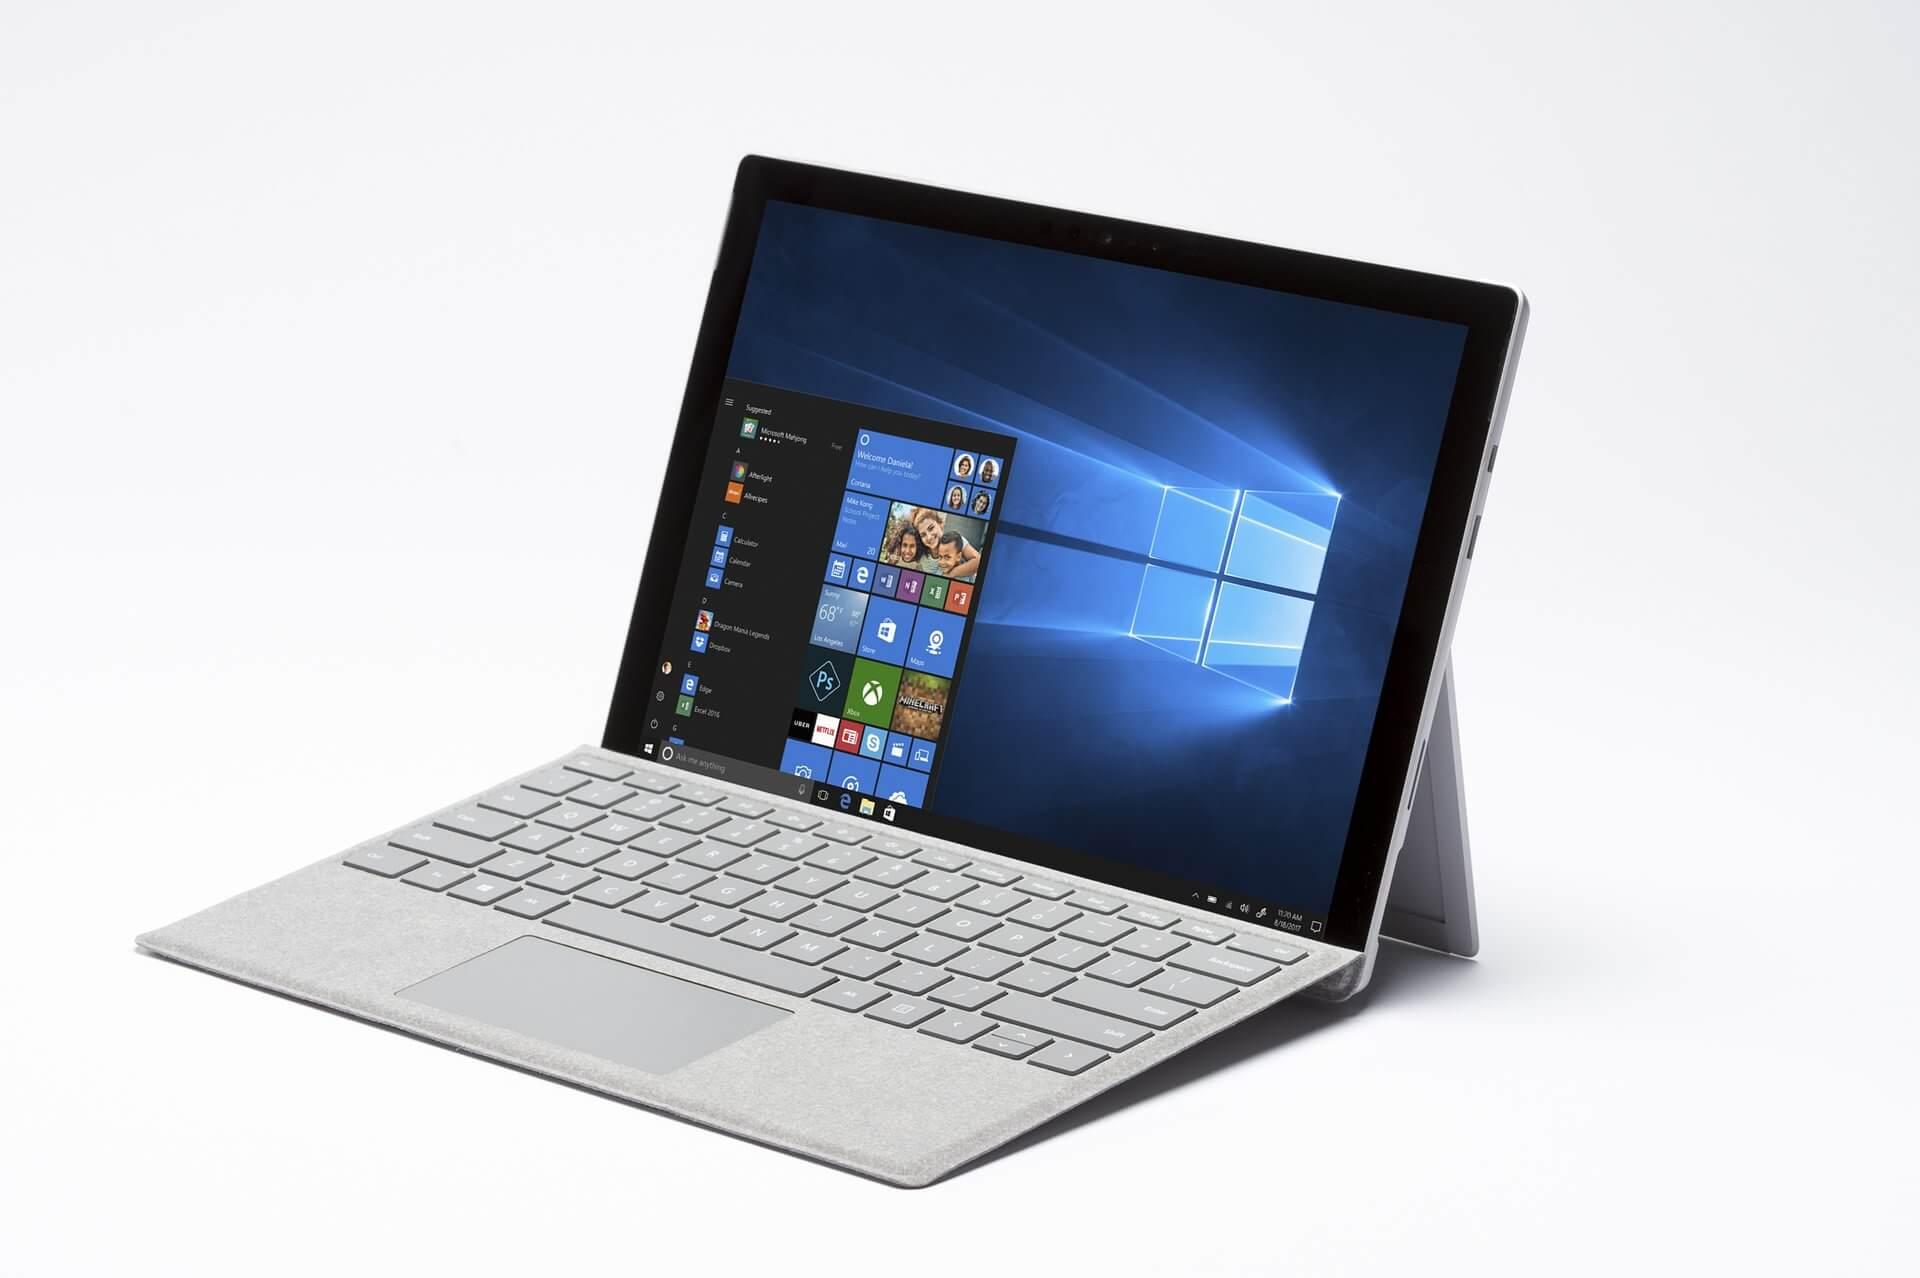 Microsoft surface pro 2017 01 rcm1920x0